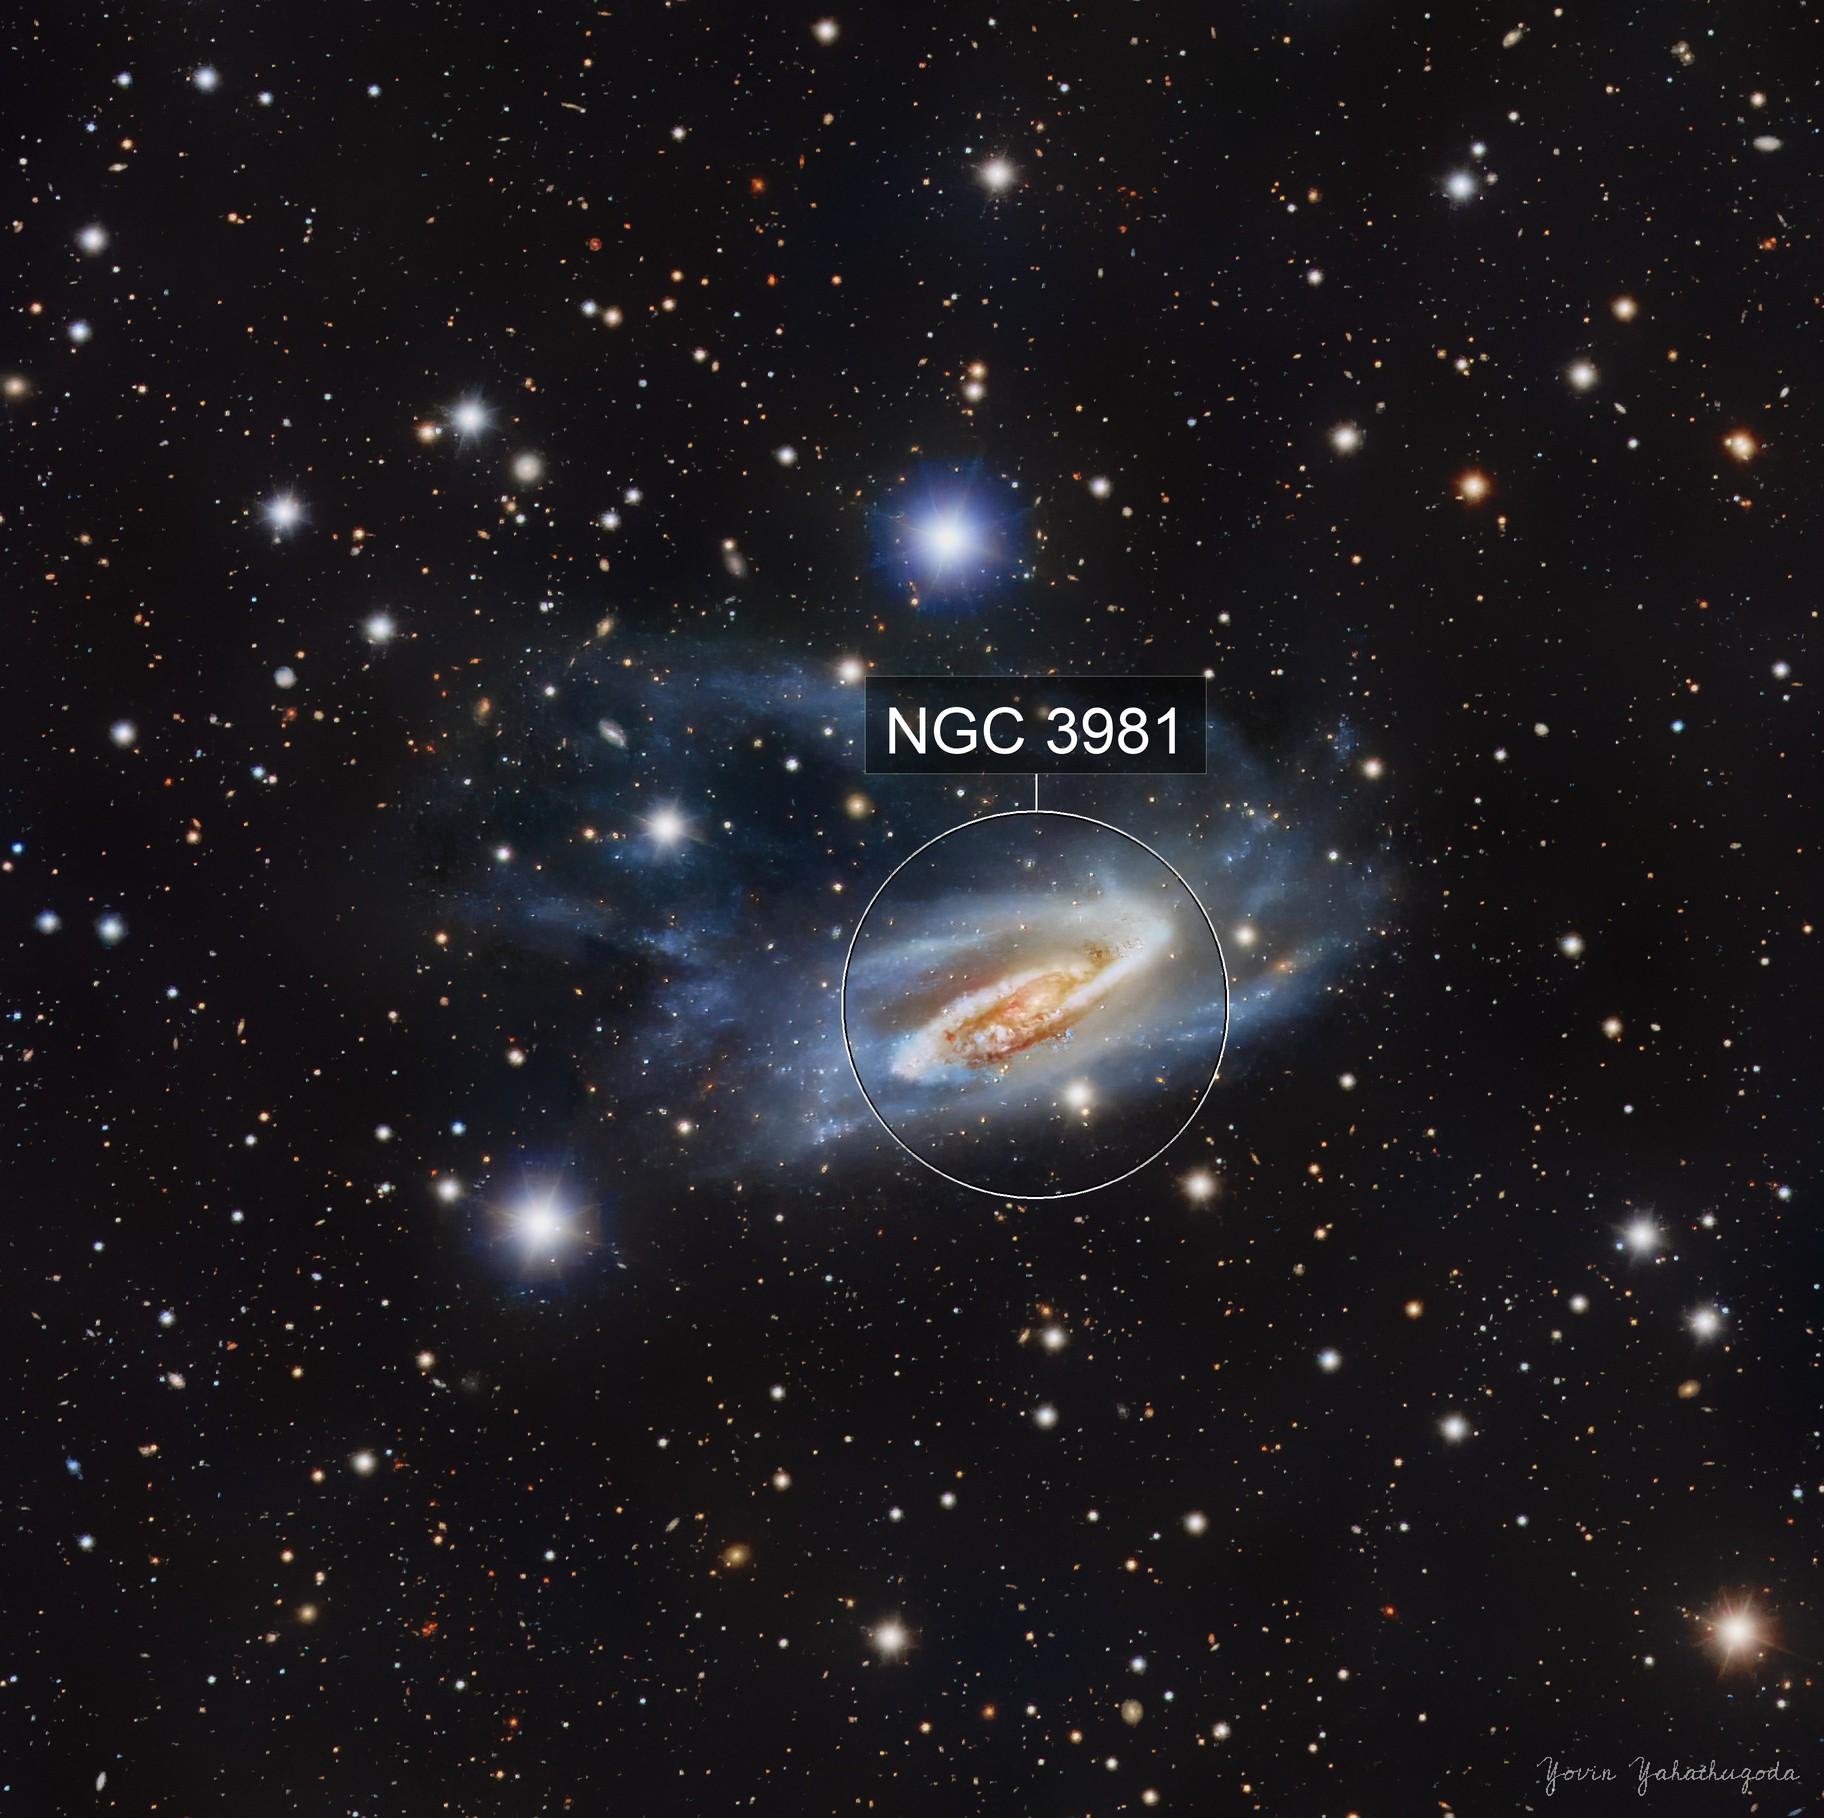 NGC 3981 - Spiral Galaxy